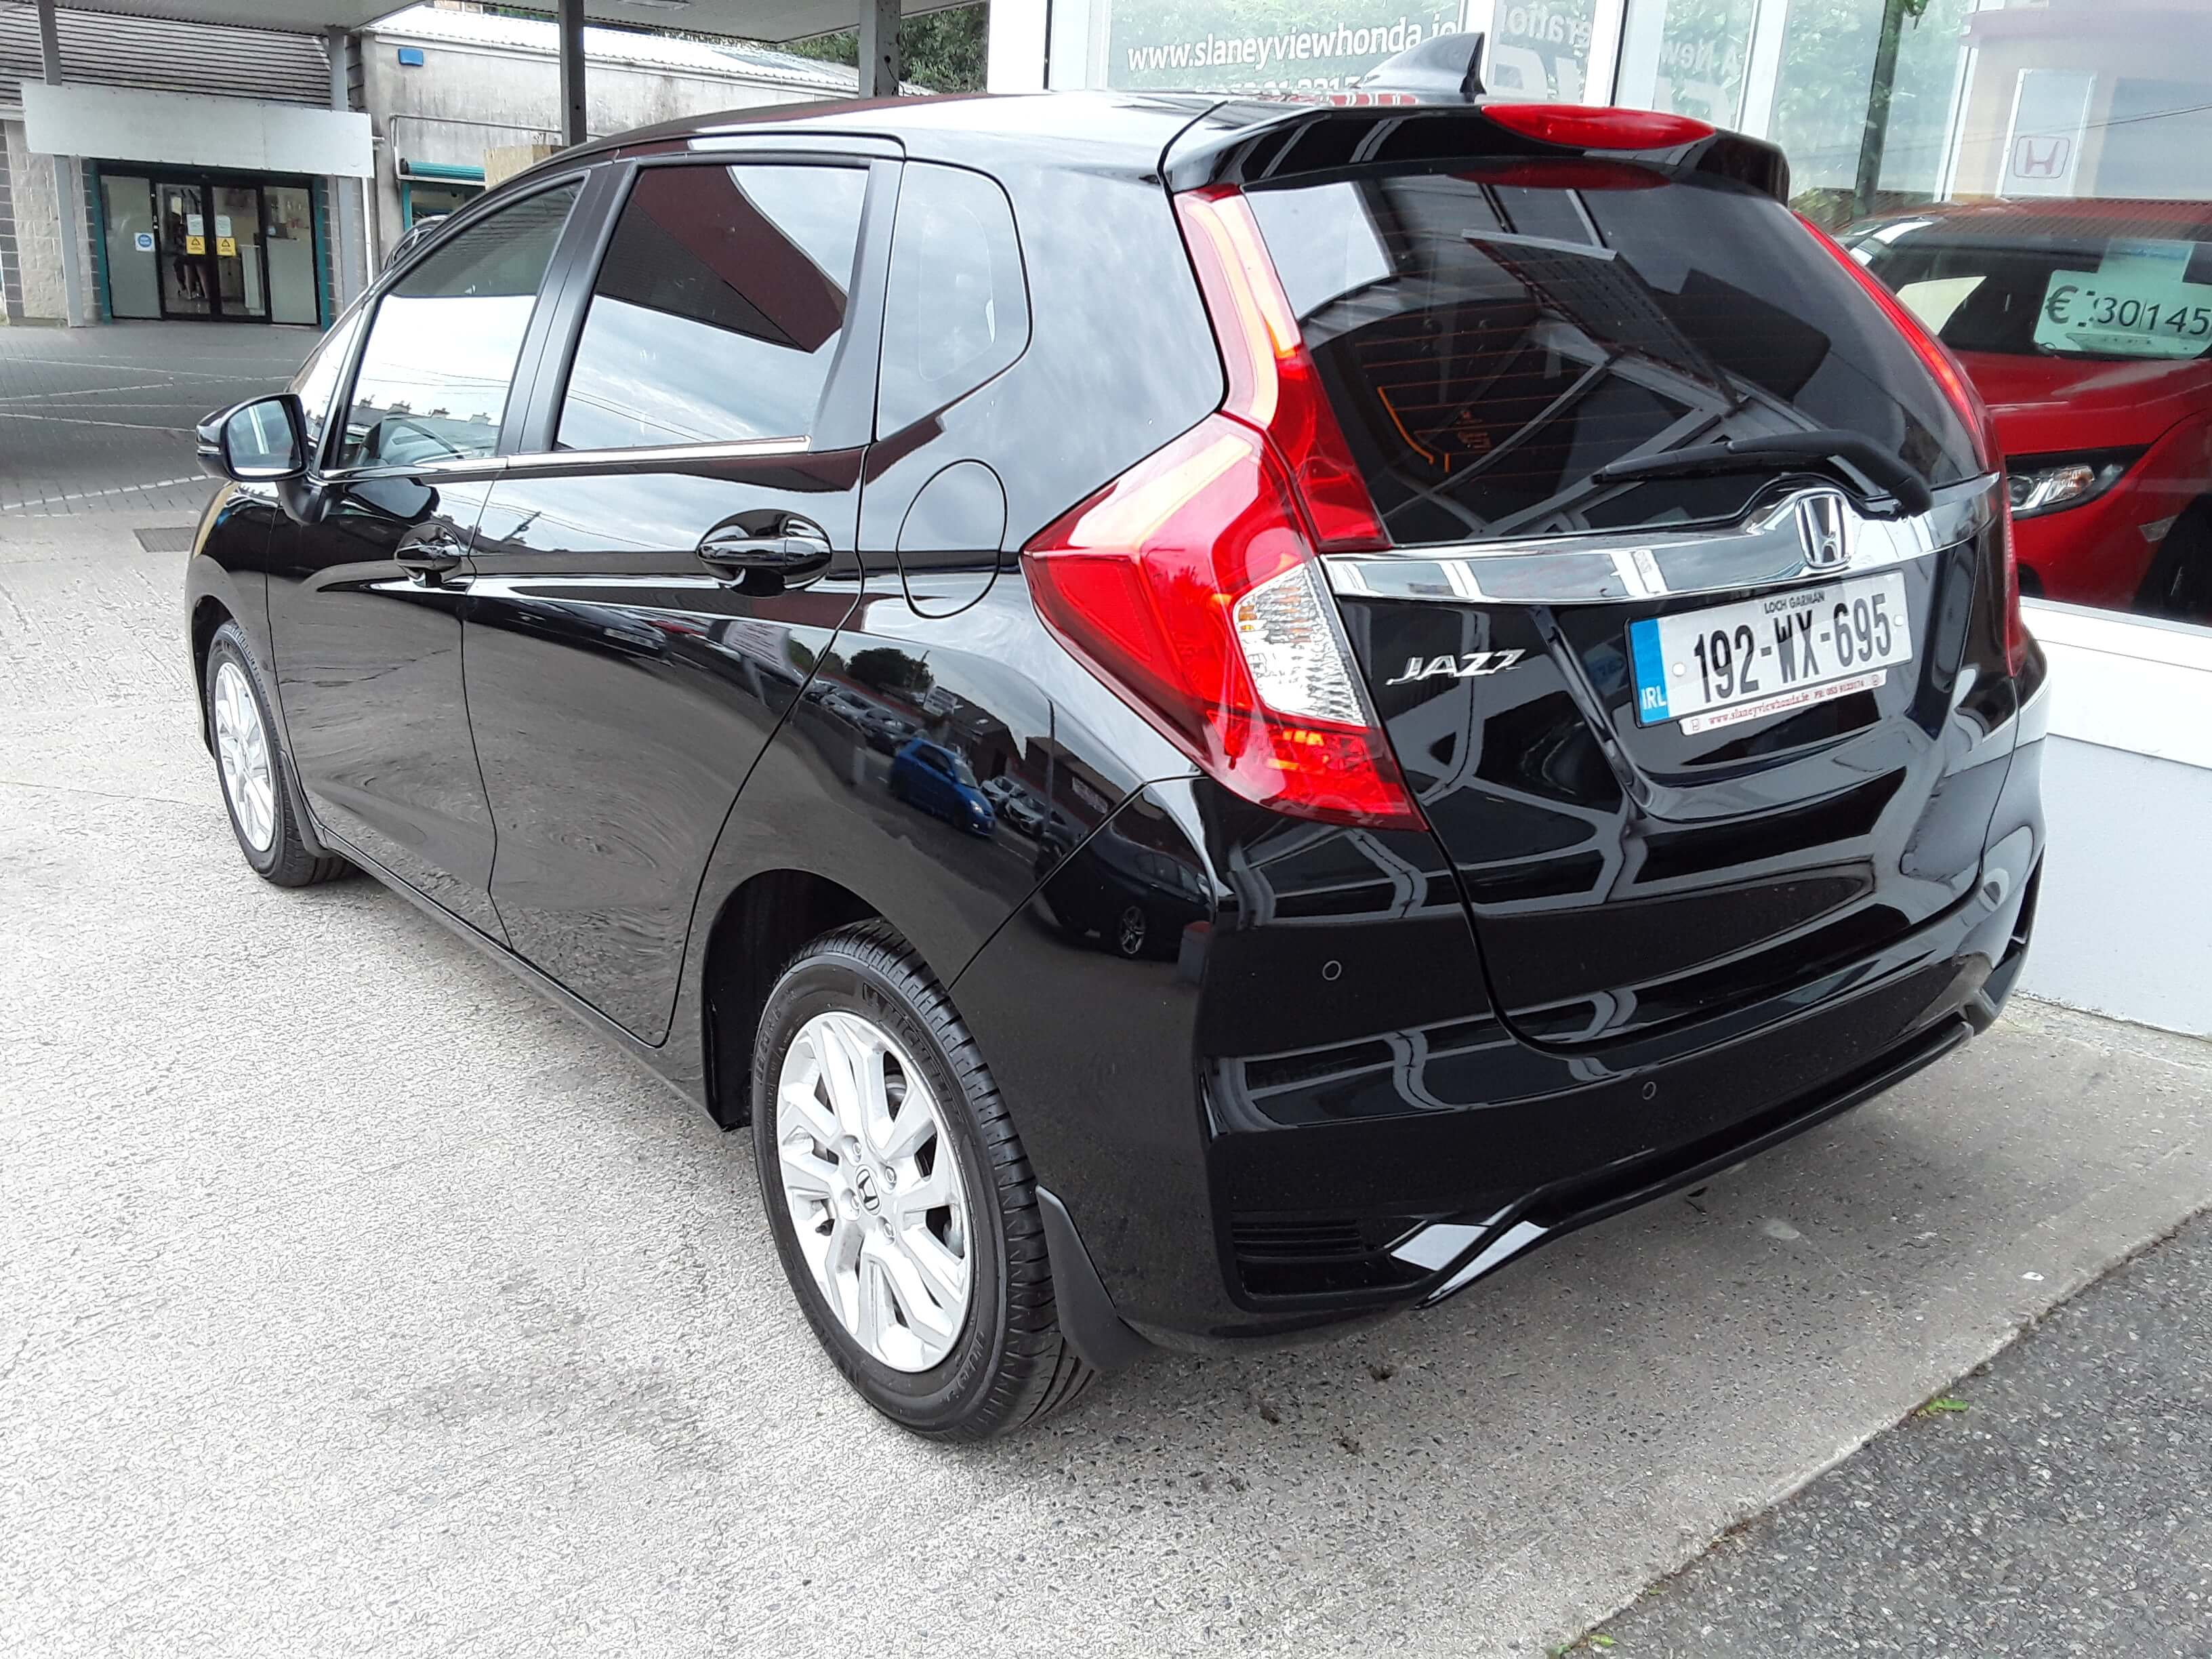 2019 Jazz 1.3 i-VTEC SE available now at Slaney View Motors Wexford